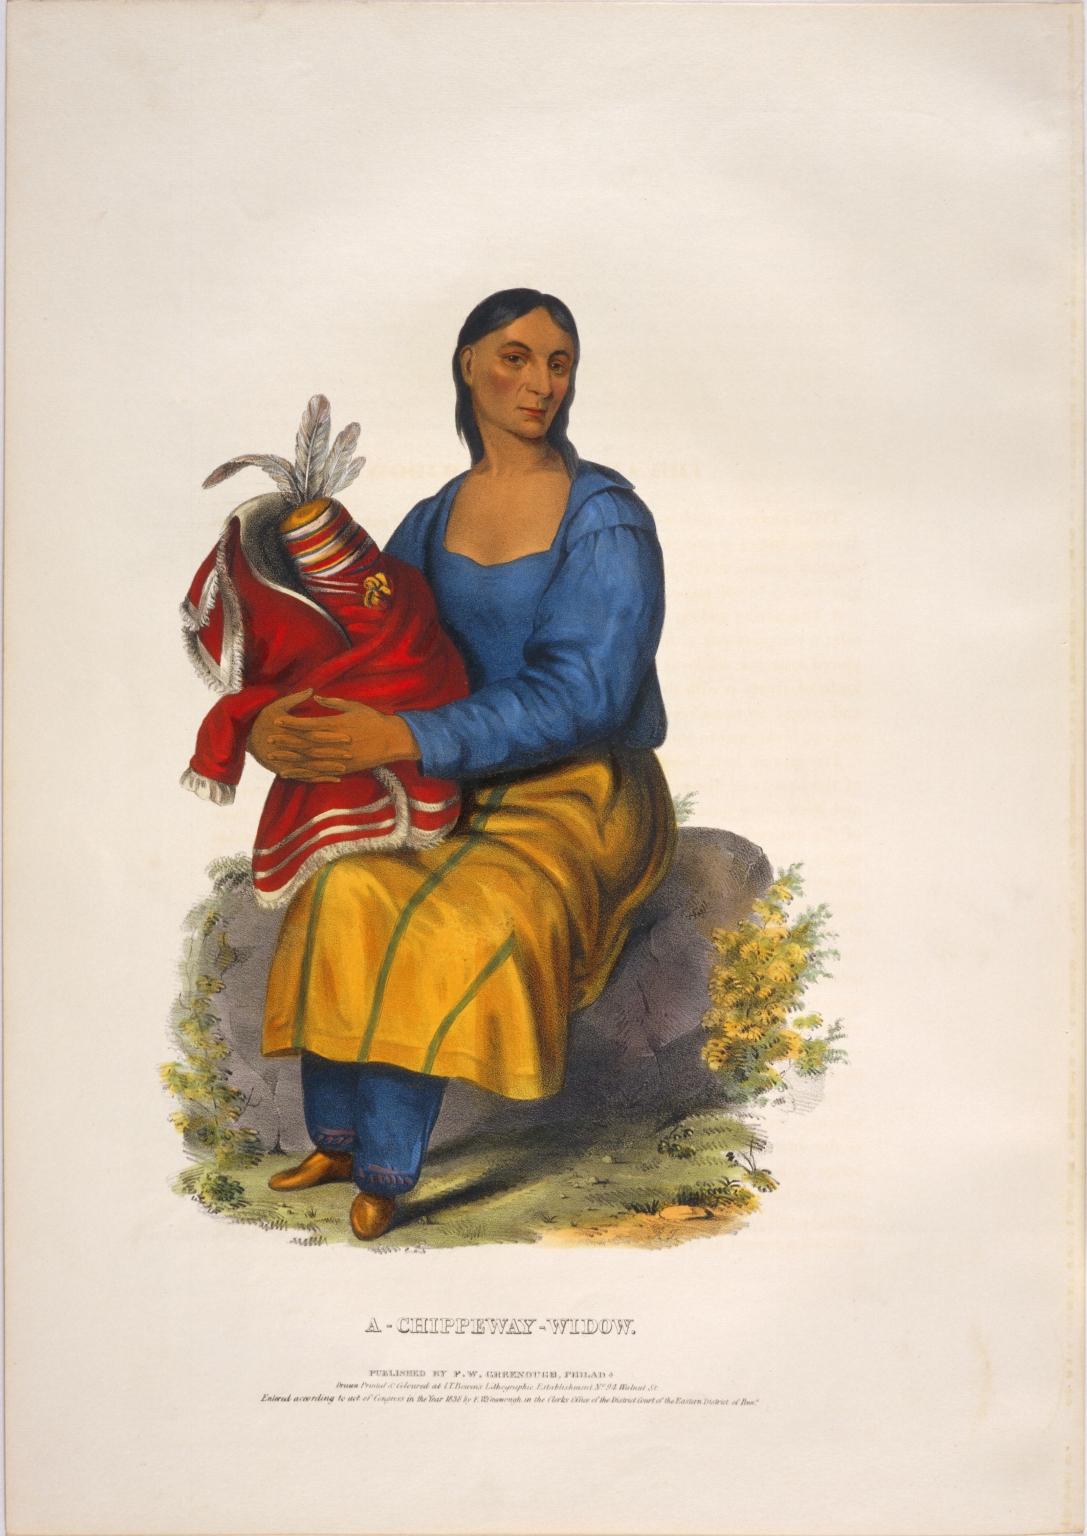 A Chippeway widow